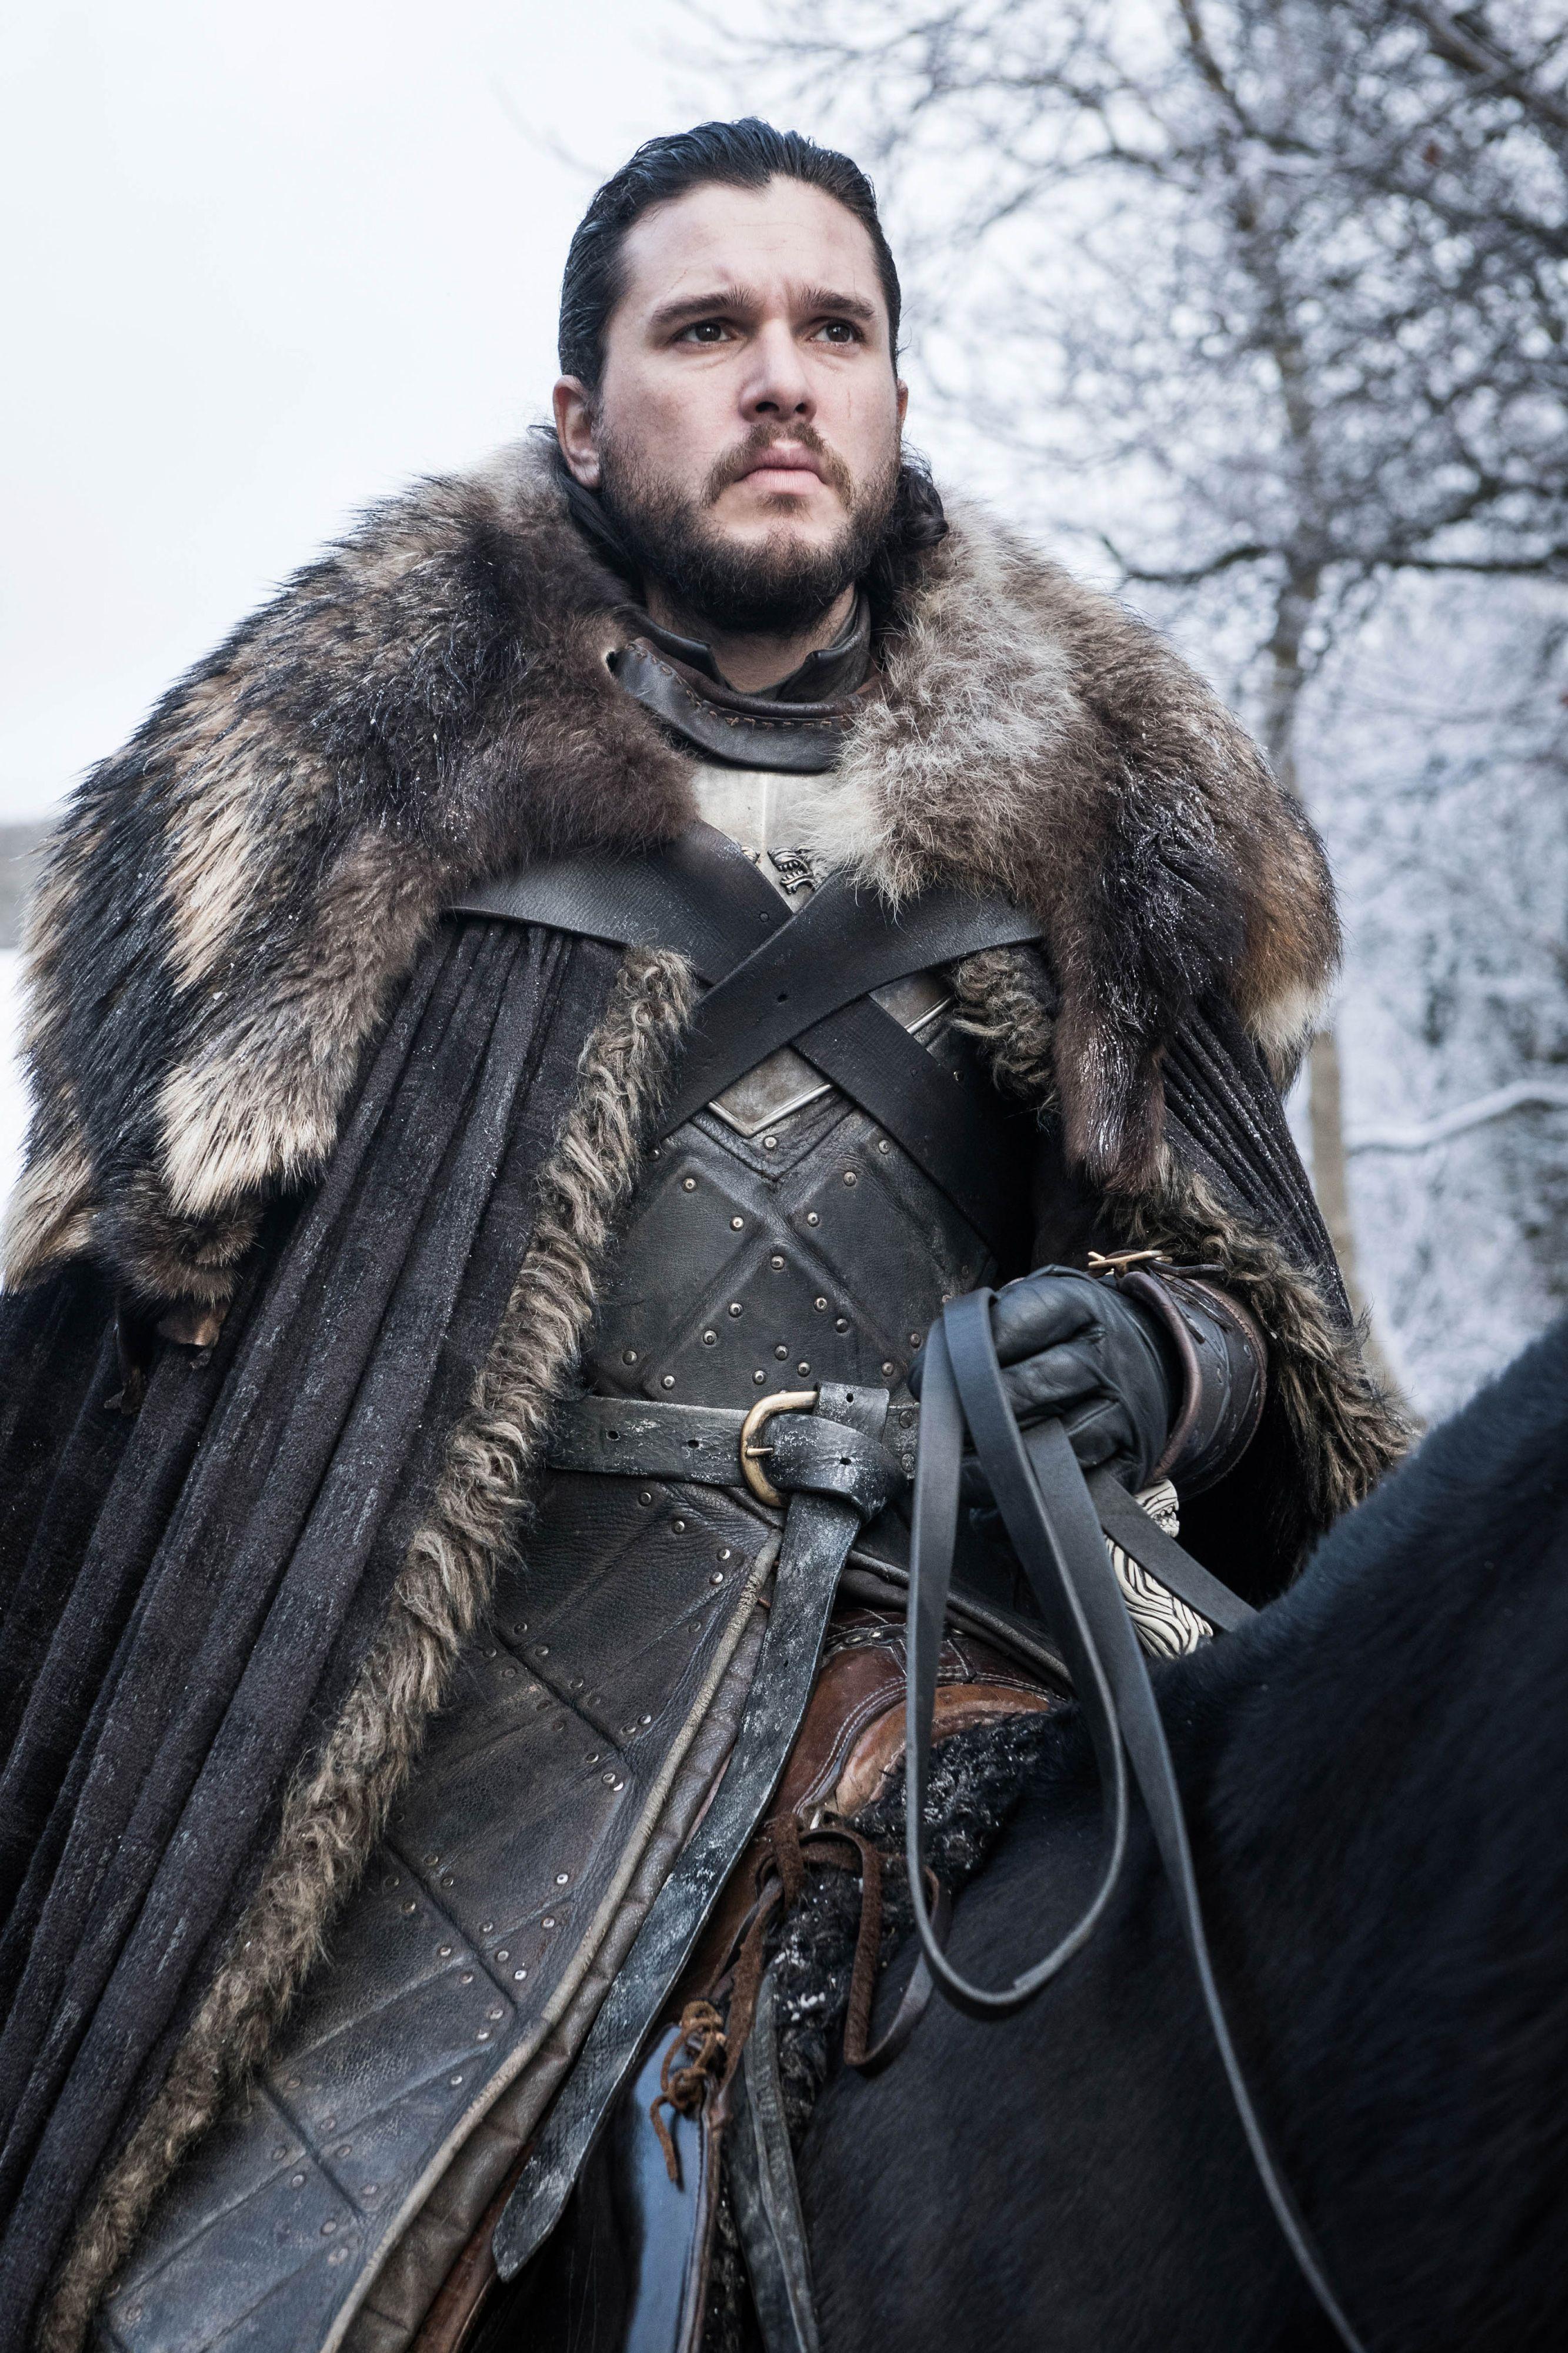 Games Of Thrones Season 8 Episode 1 Streaming : games, thrones, season, episode, streaming, Thrones, Watch